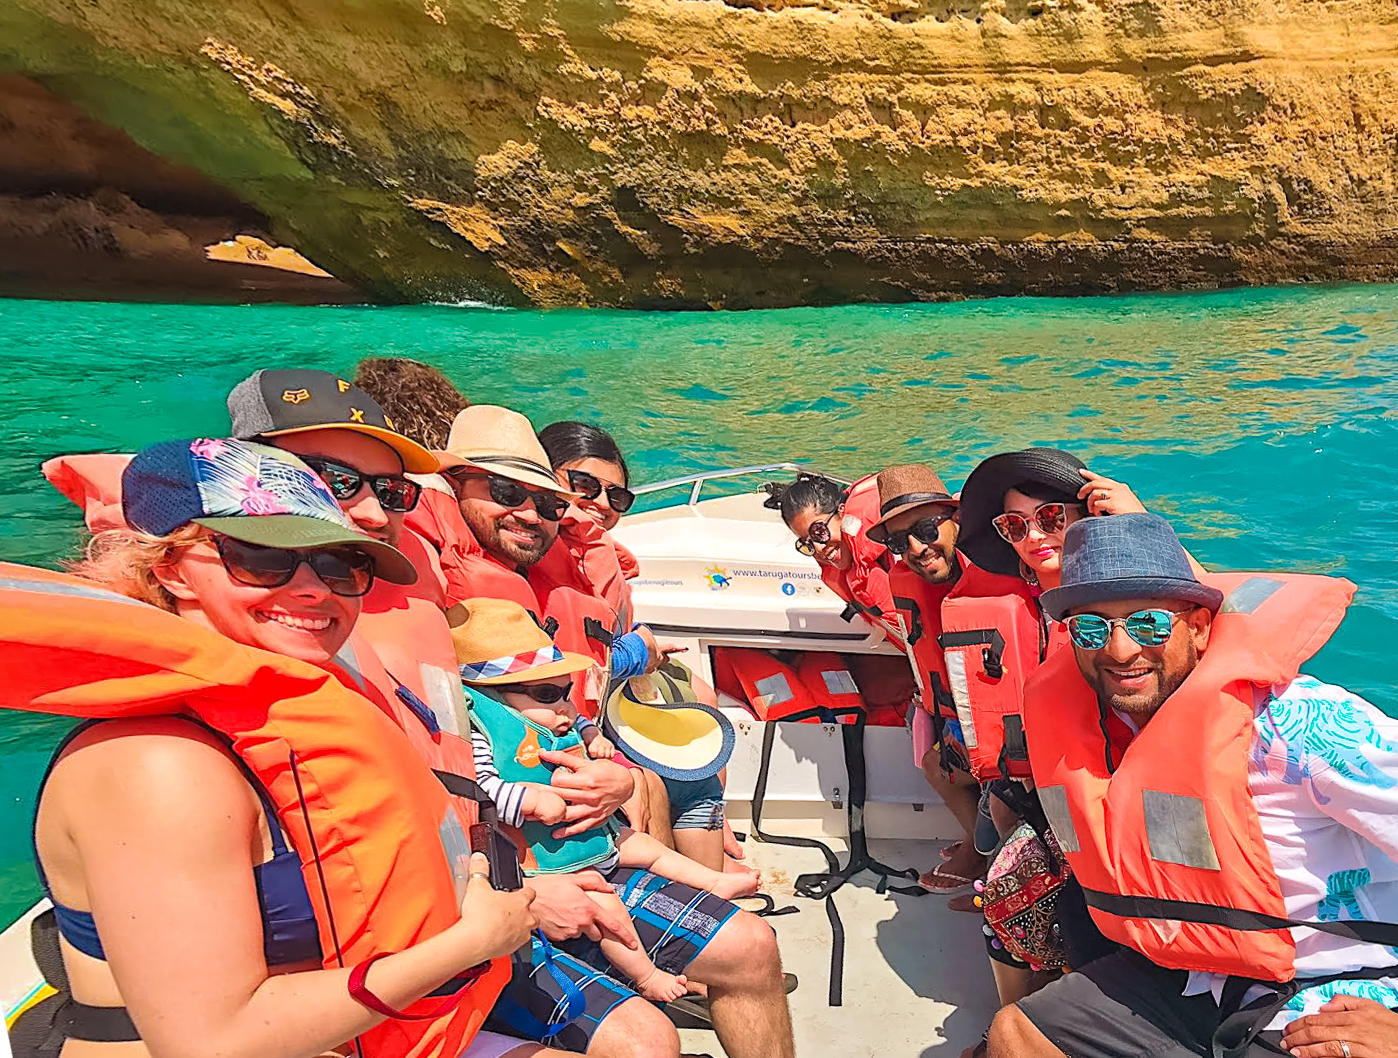 People wearing lifejackets on Benagil boat tour